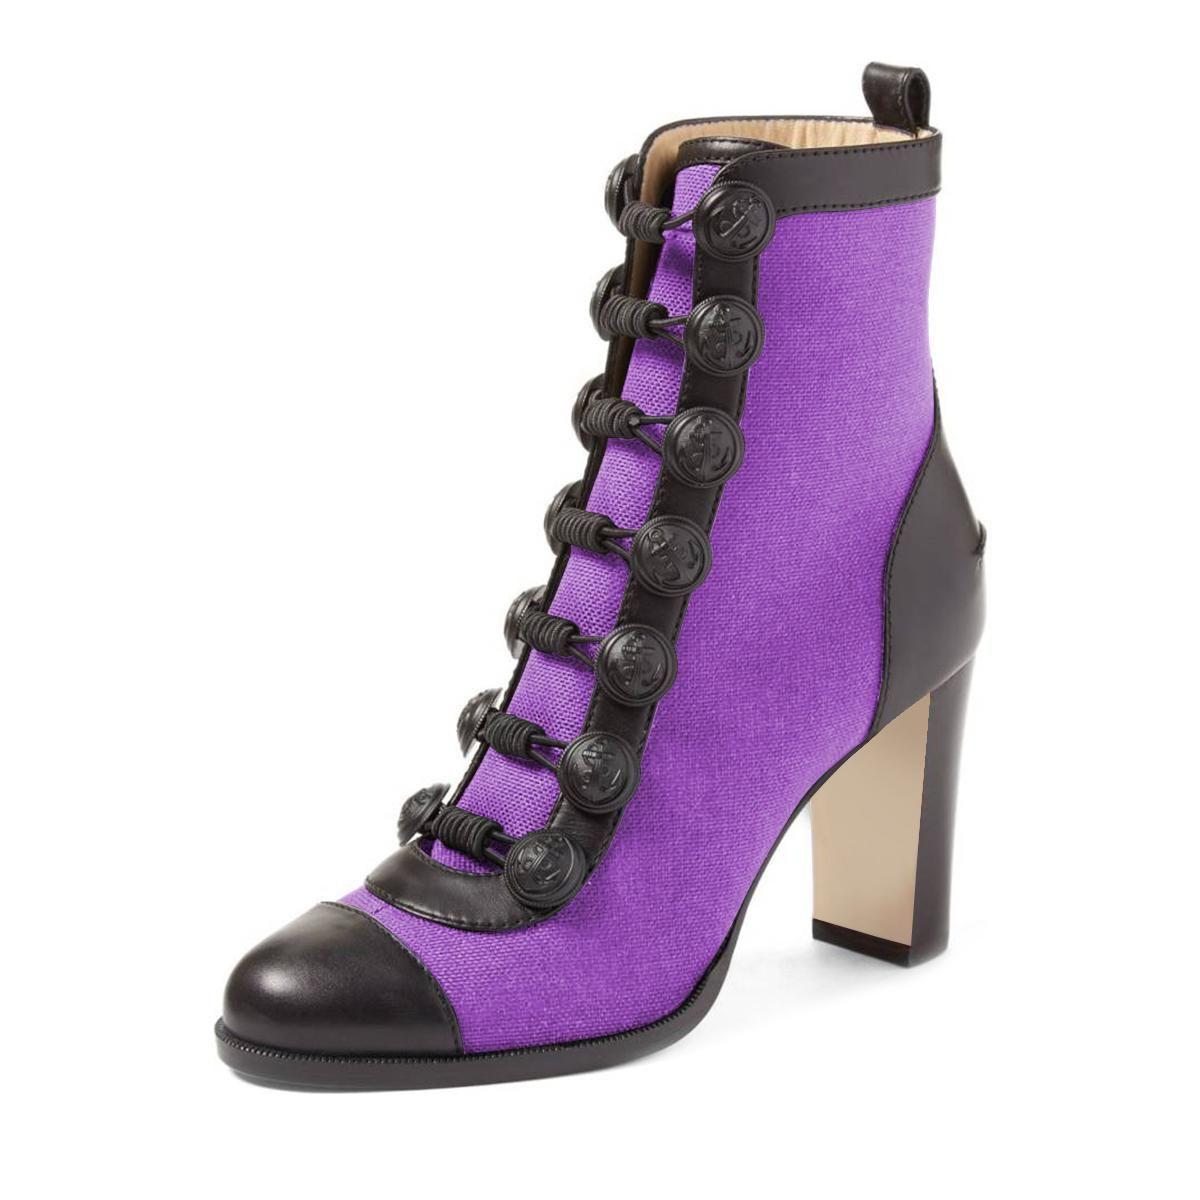 d0628f3d8 #FSJshoes - #FSJ Shoes Women's Purple Commuting Round Toe Chunky Heels  Ankle Boots - AdoreWe.com